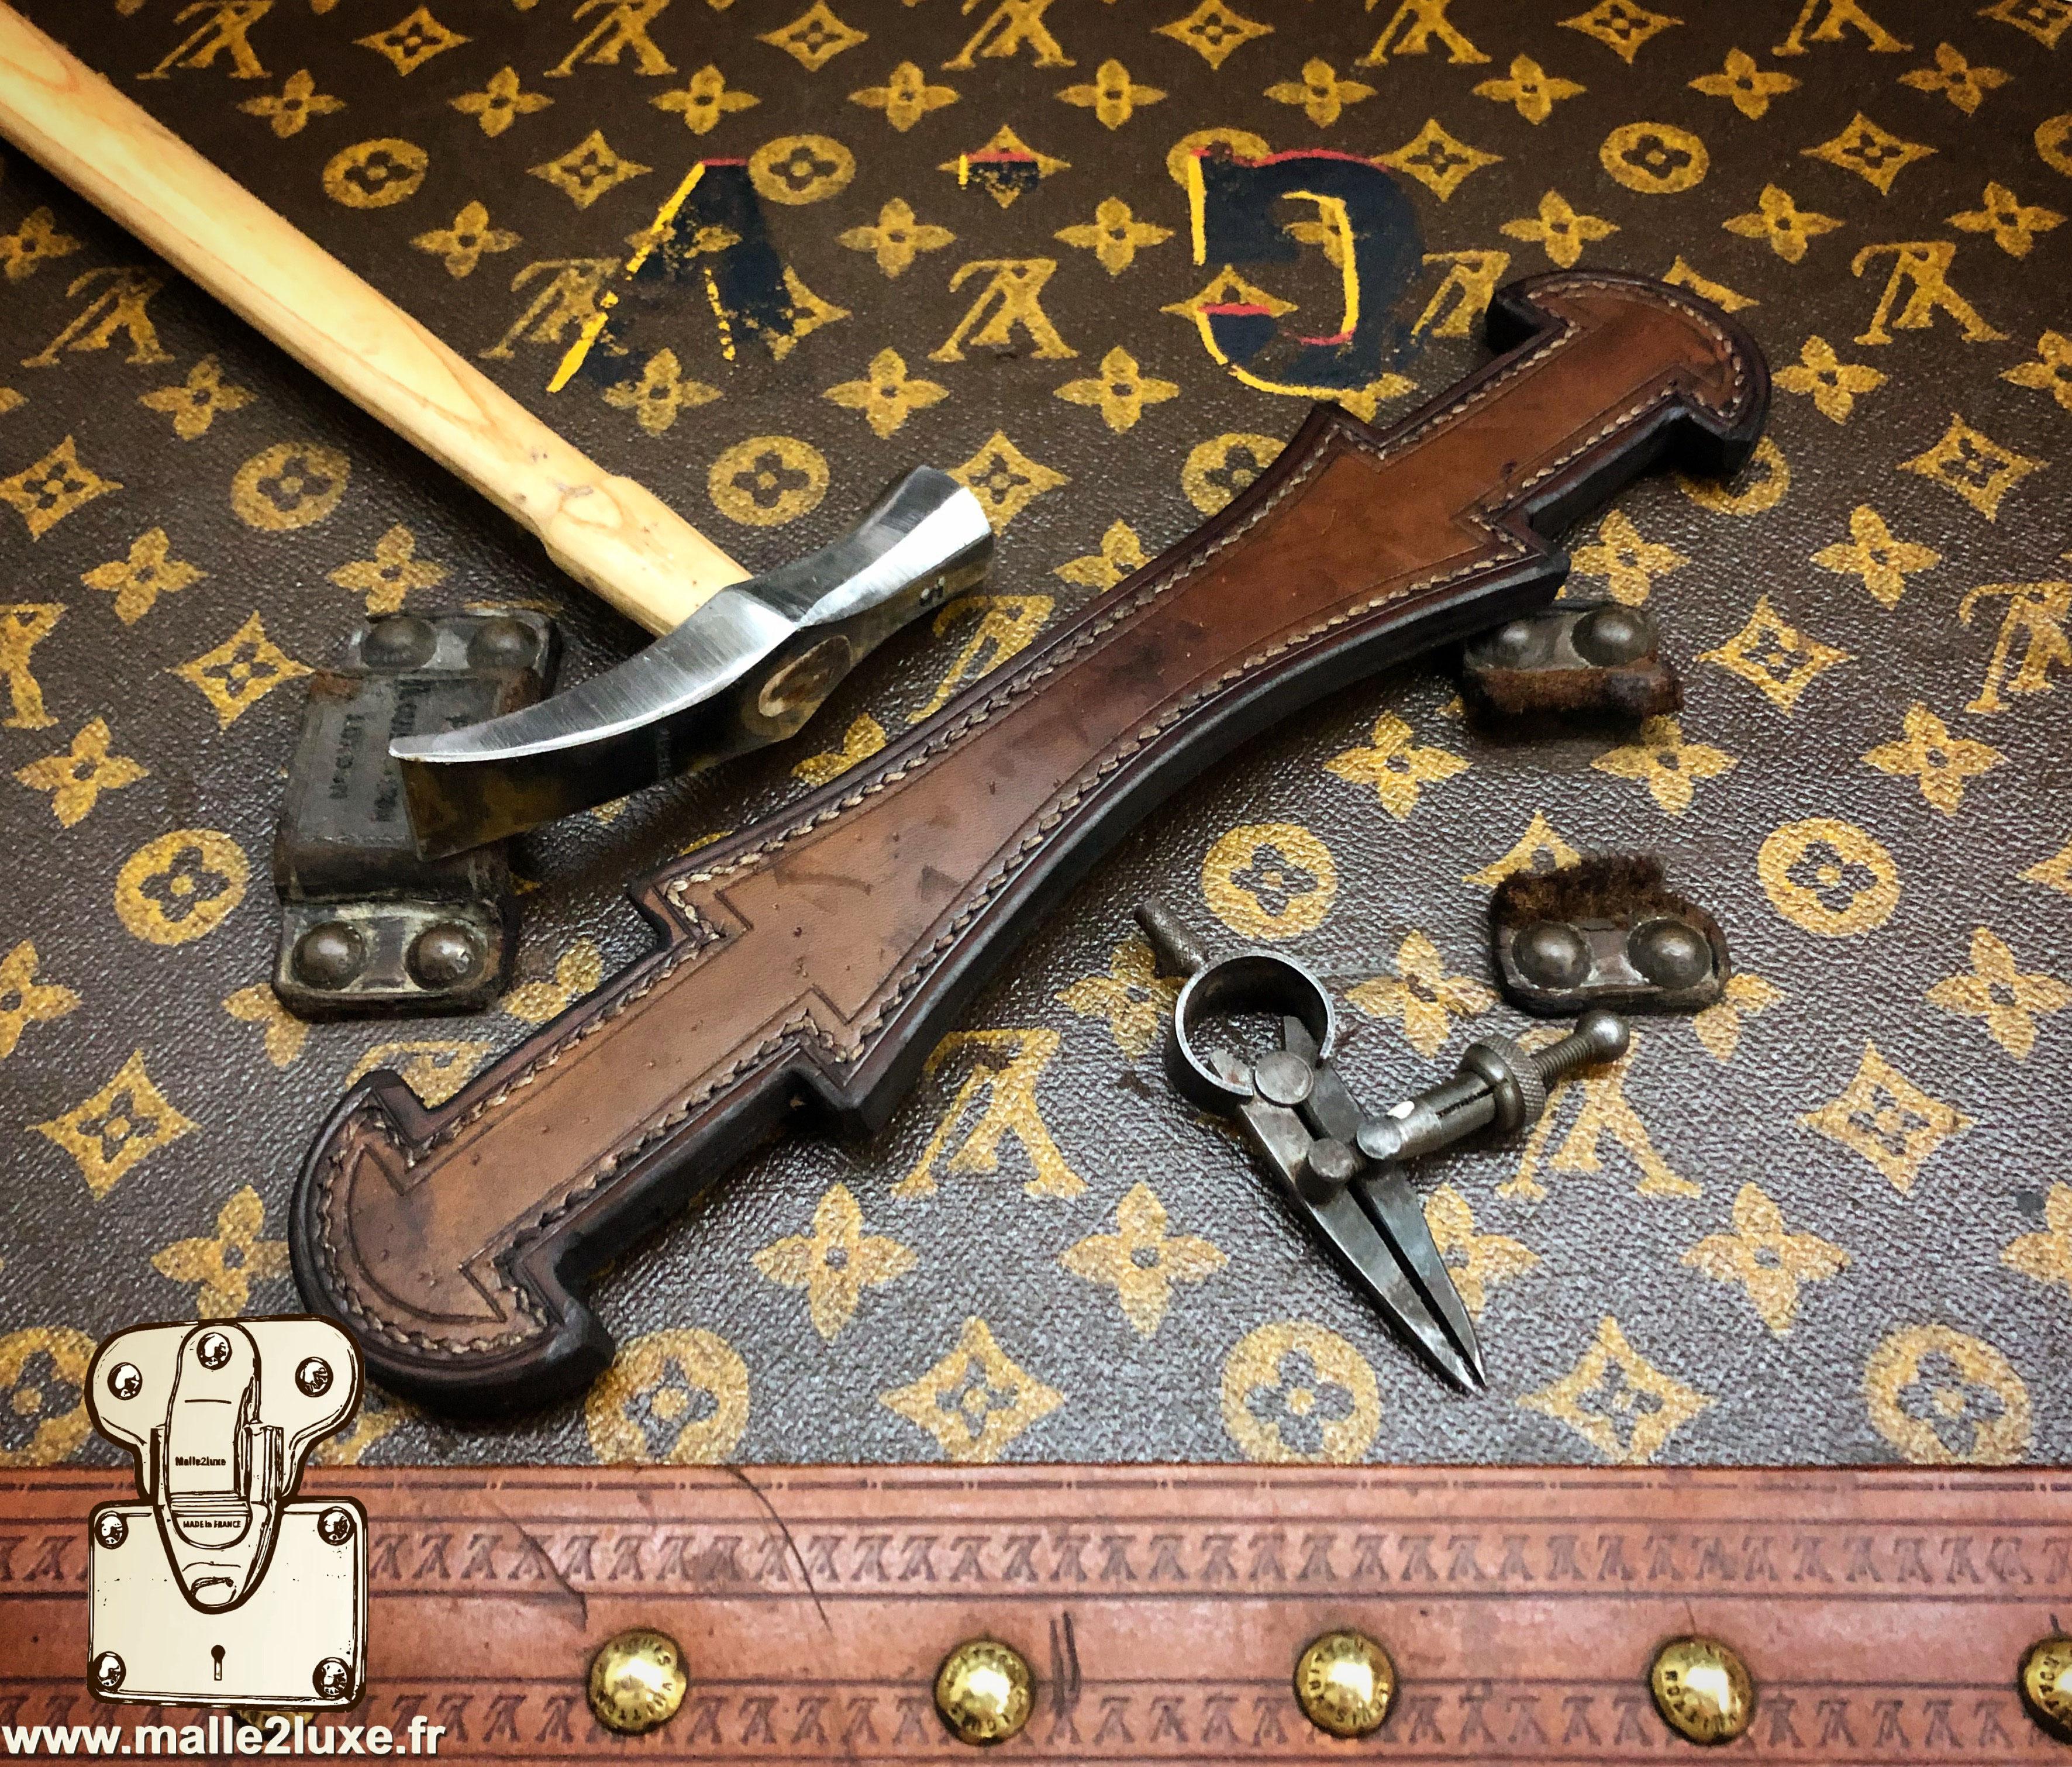 Tout Savoir Sur Le Cuir atelier cuir : sellier, maroquinier, ecrin, louis vuitton